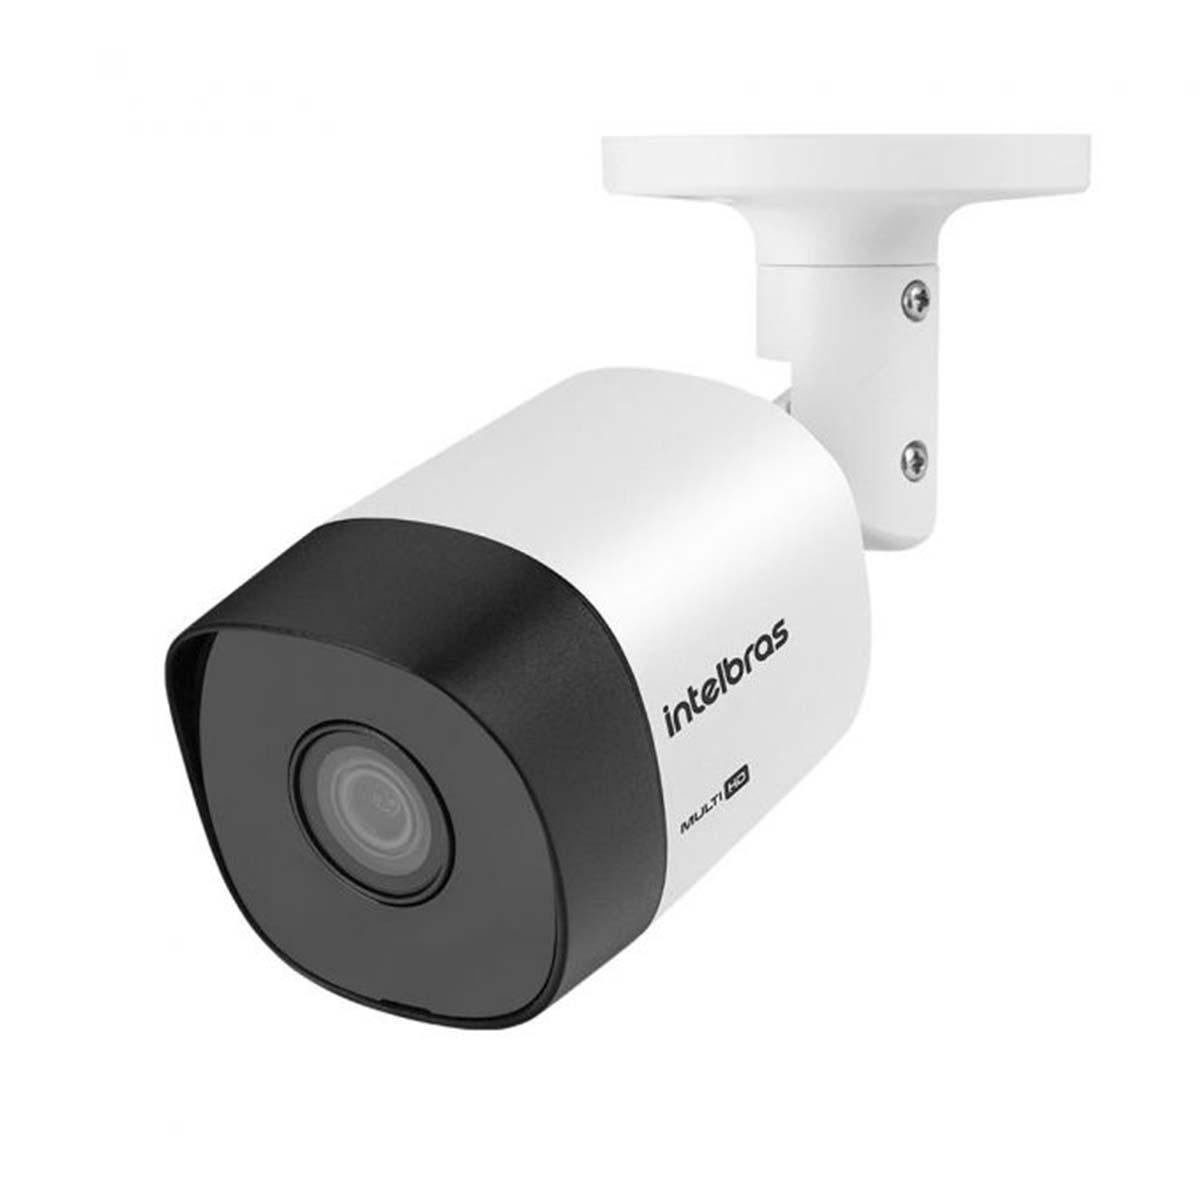 Kit 07 Câmera Bullet Intelbras Vhd 3130 B G6 720p 3,6mm